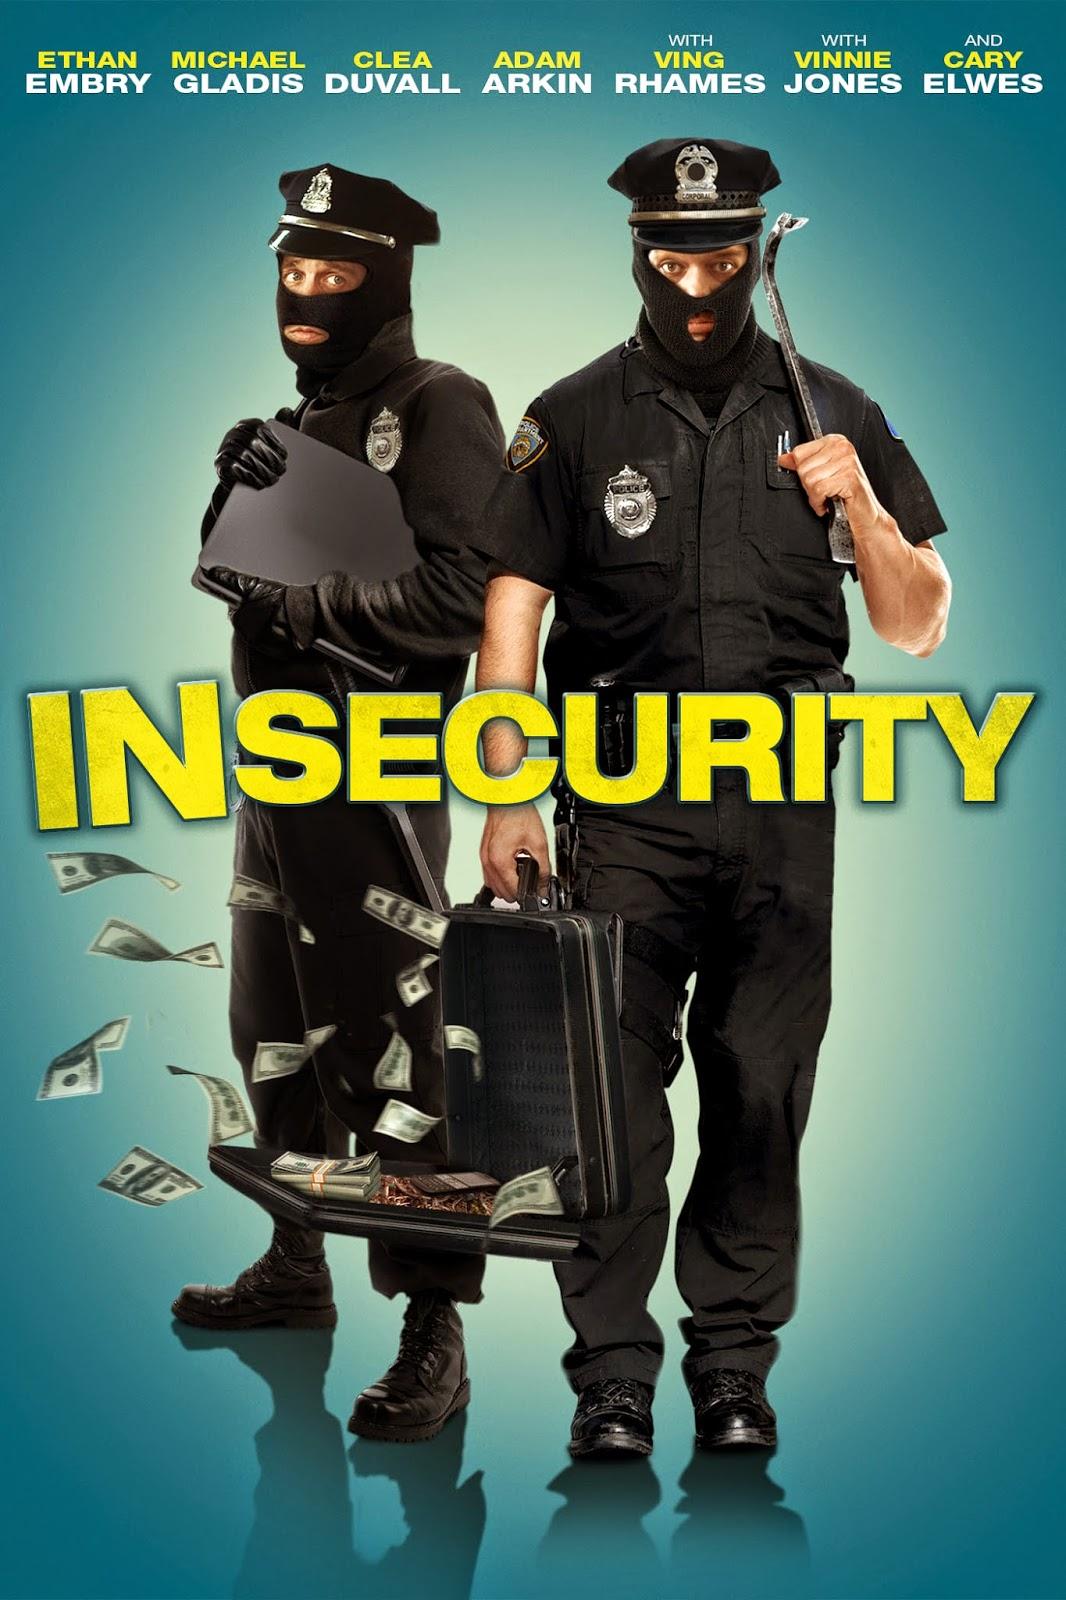 In Security คู่ป่วนลวงแผนปล้น [HD]